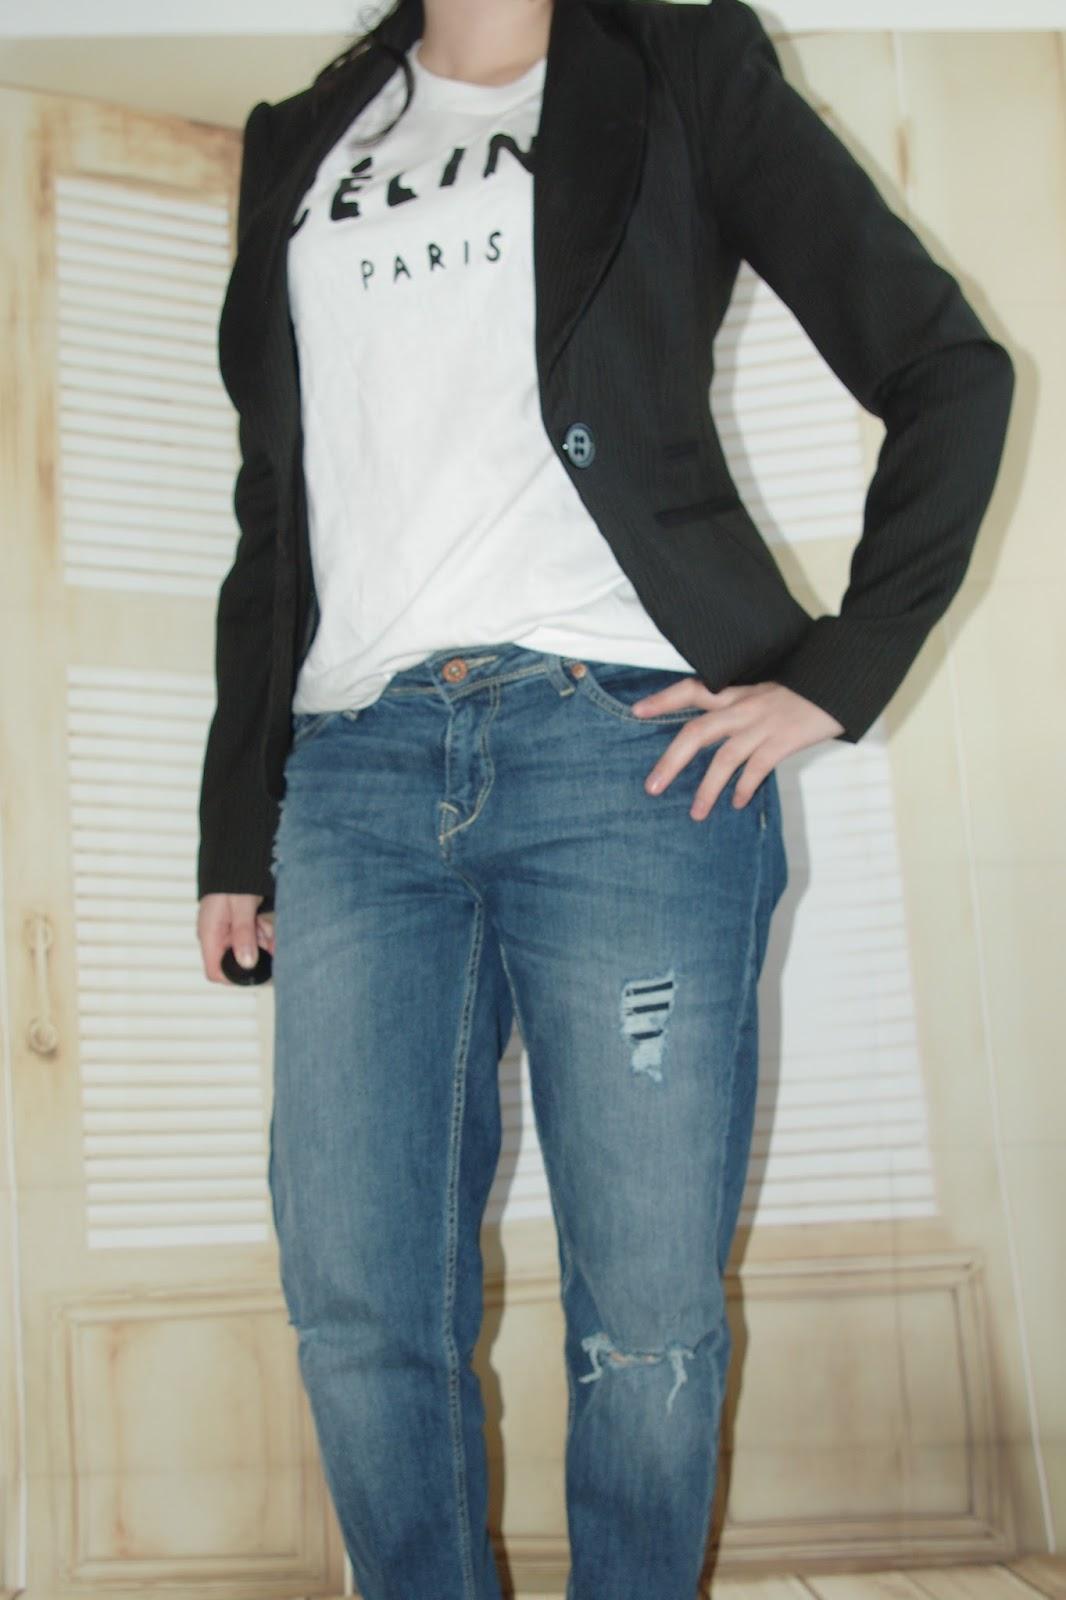 Boyfriend Jeans, Céline-Shirt, Blazer Outfit